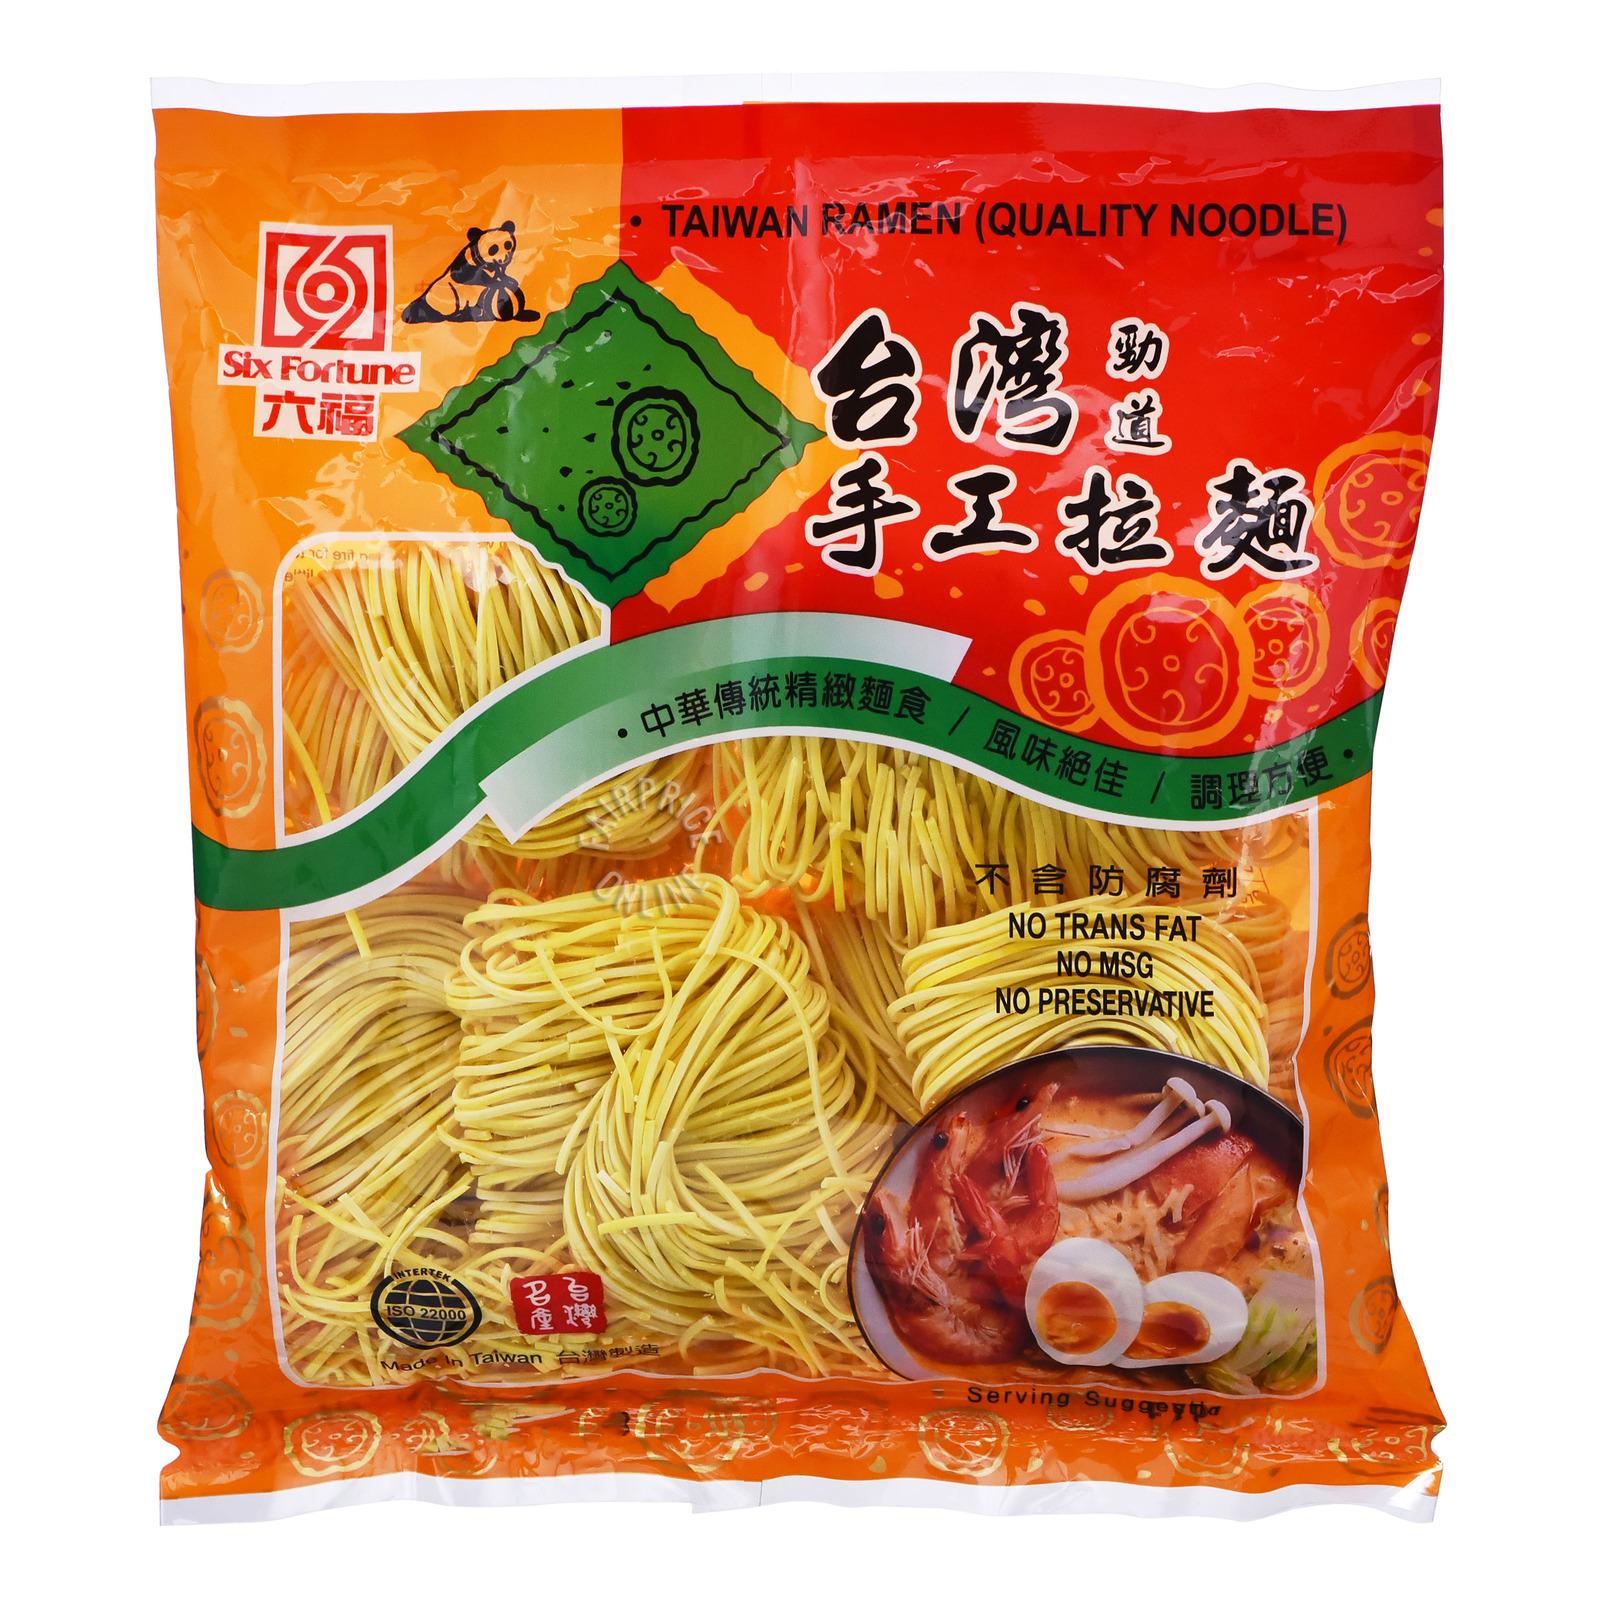 Six Fortune Taiwan Ramen Noodle